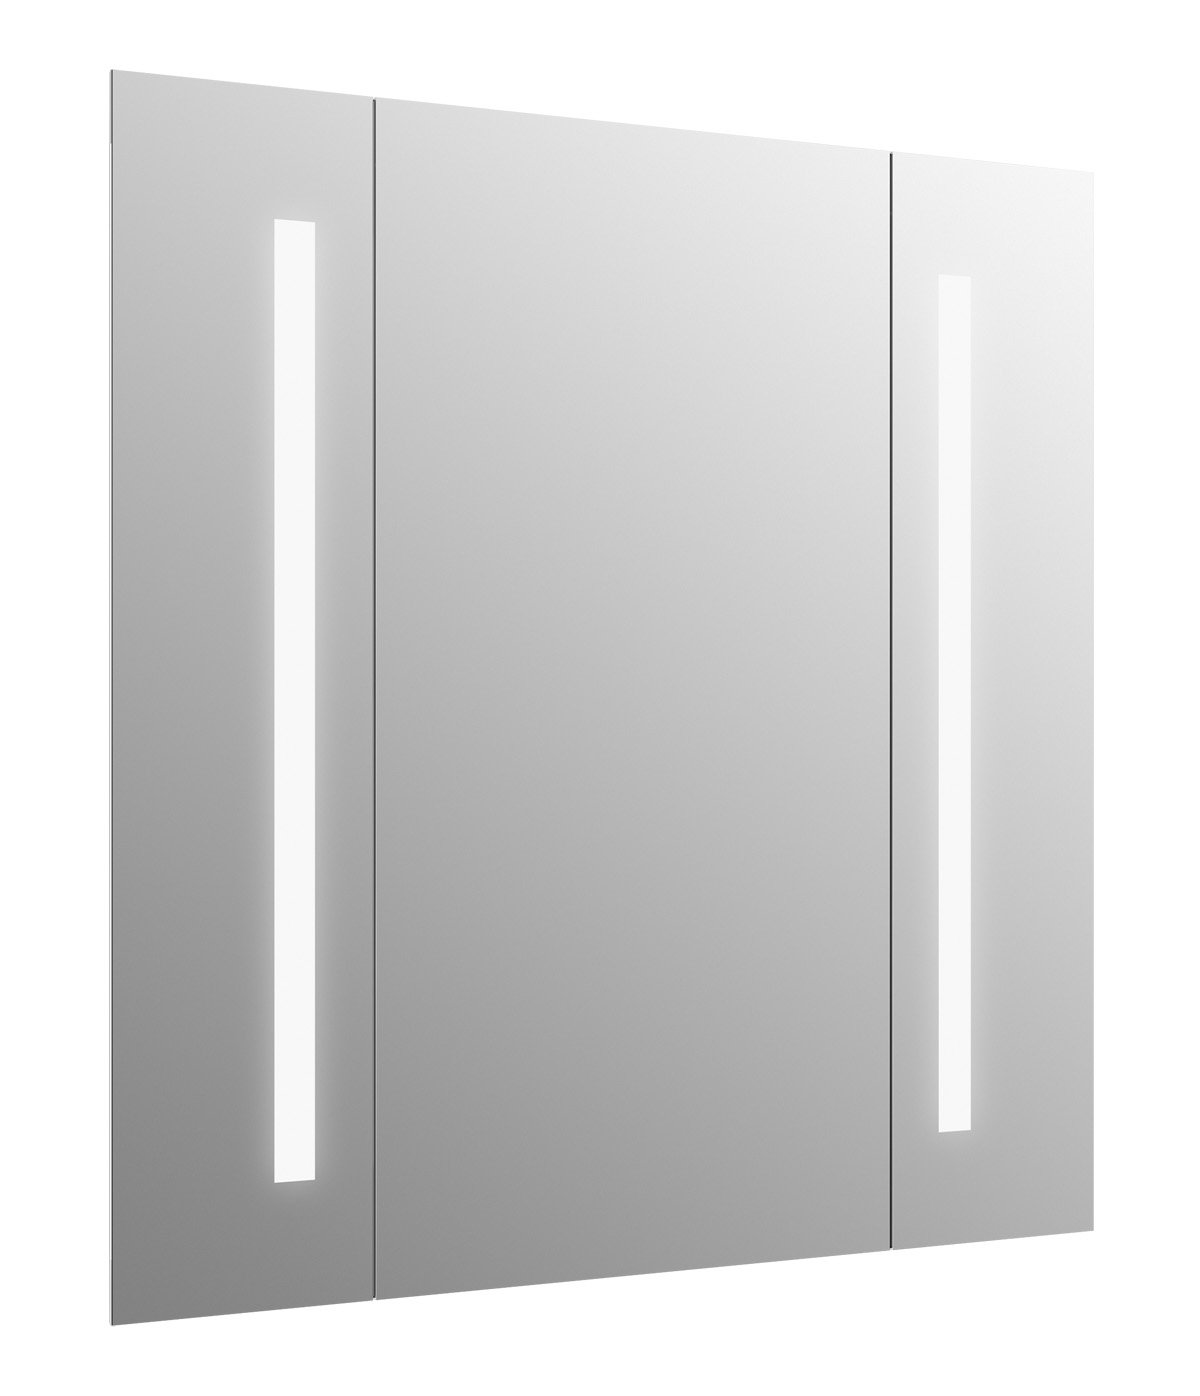 KOHLER 99572-TL-NA Verdera Lighted Mirror, Aluminum, 34''x33''